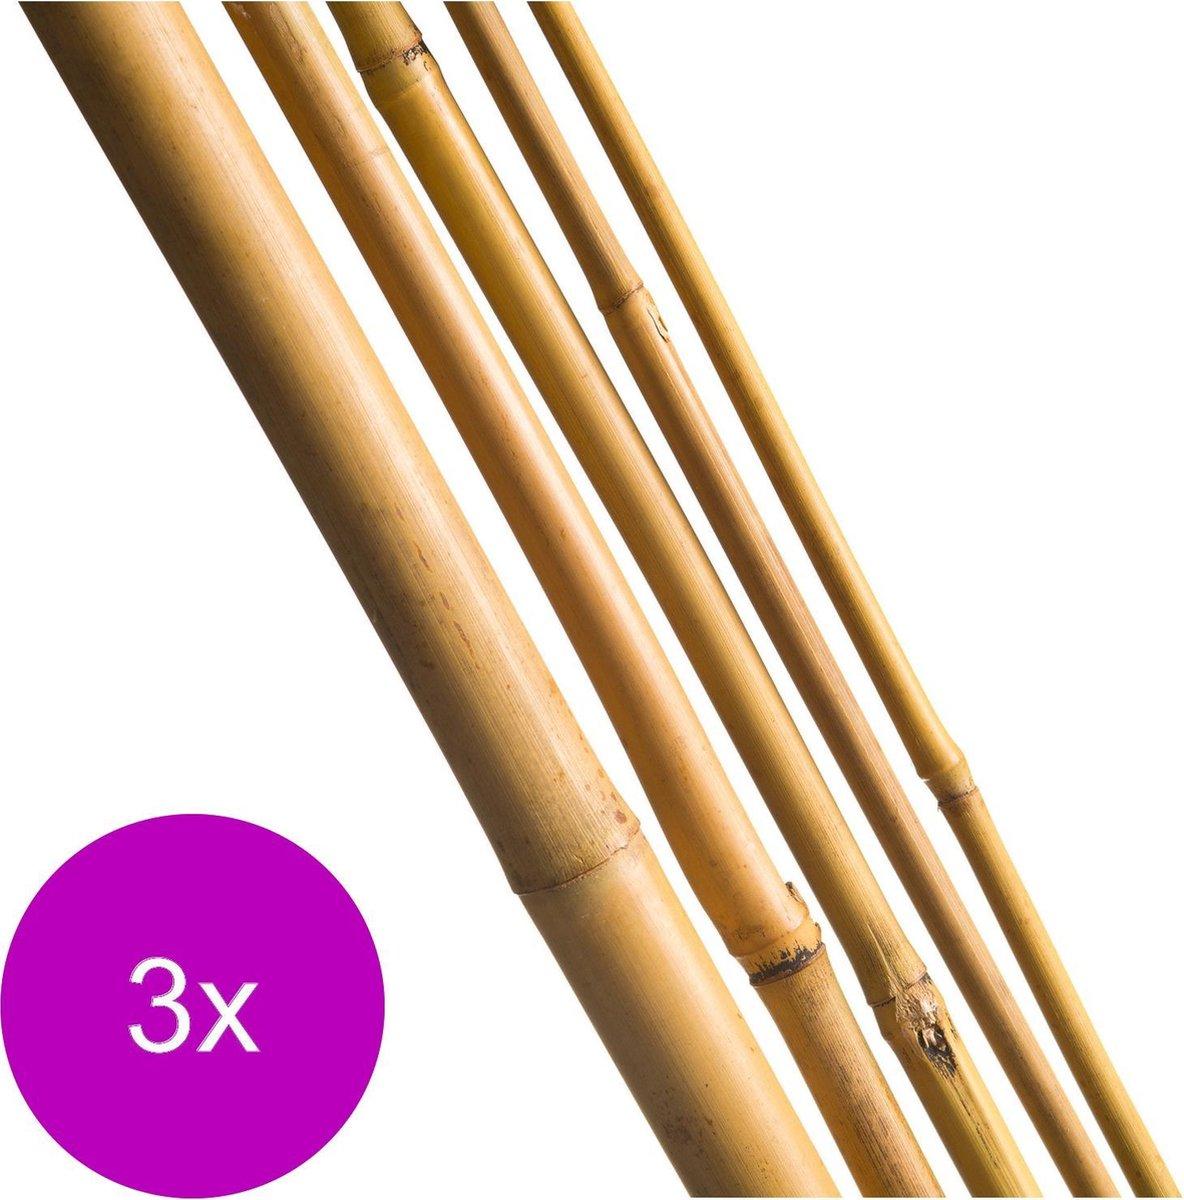 Nature Bamboestok Naturel - Klim-En Geleide Artikel - 3 x 1.2x1x120 cm